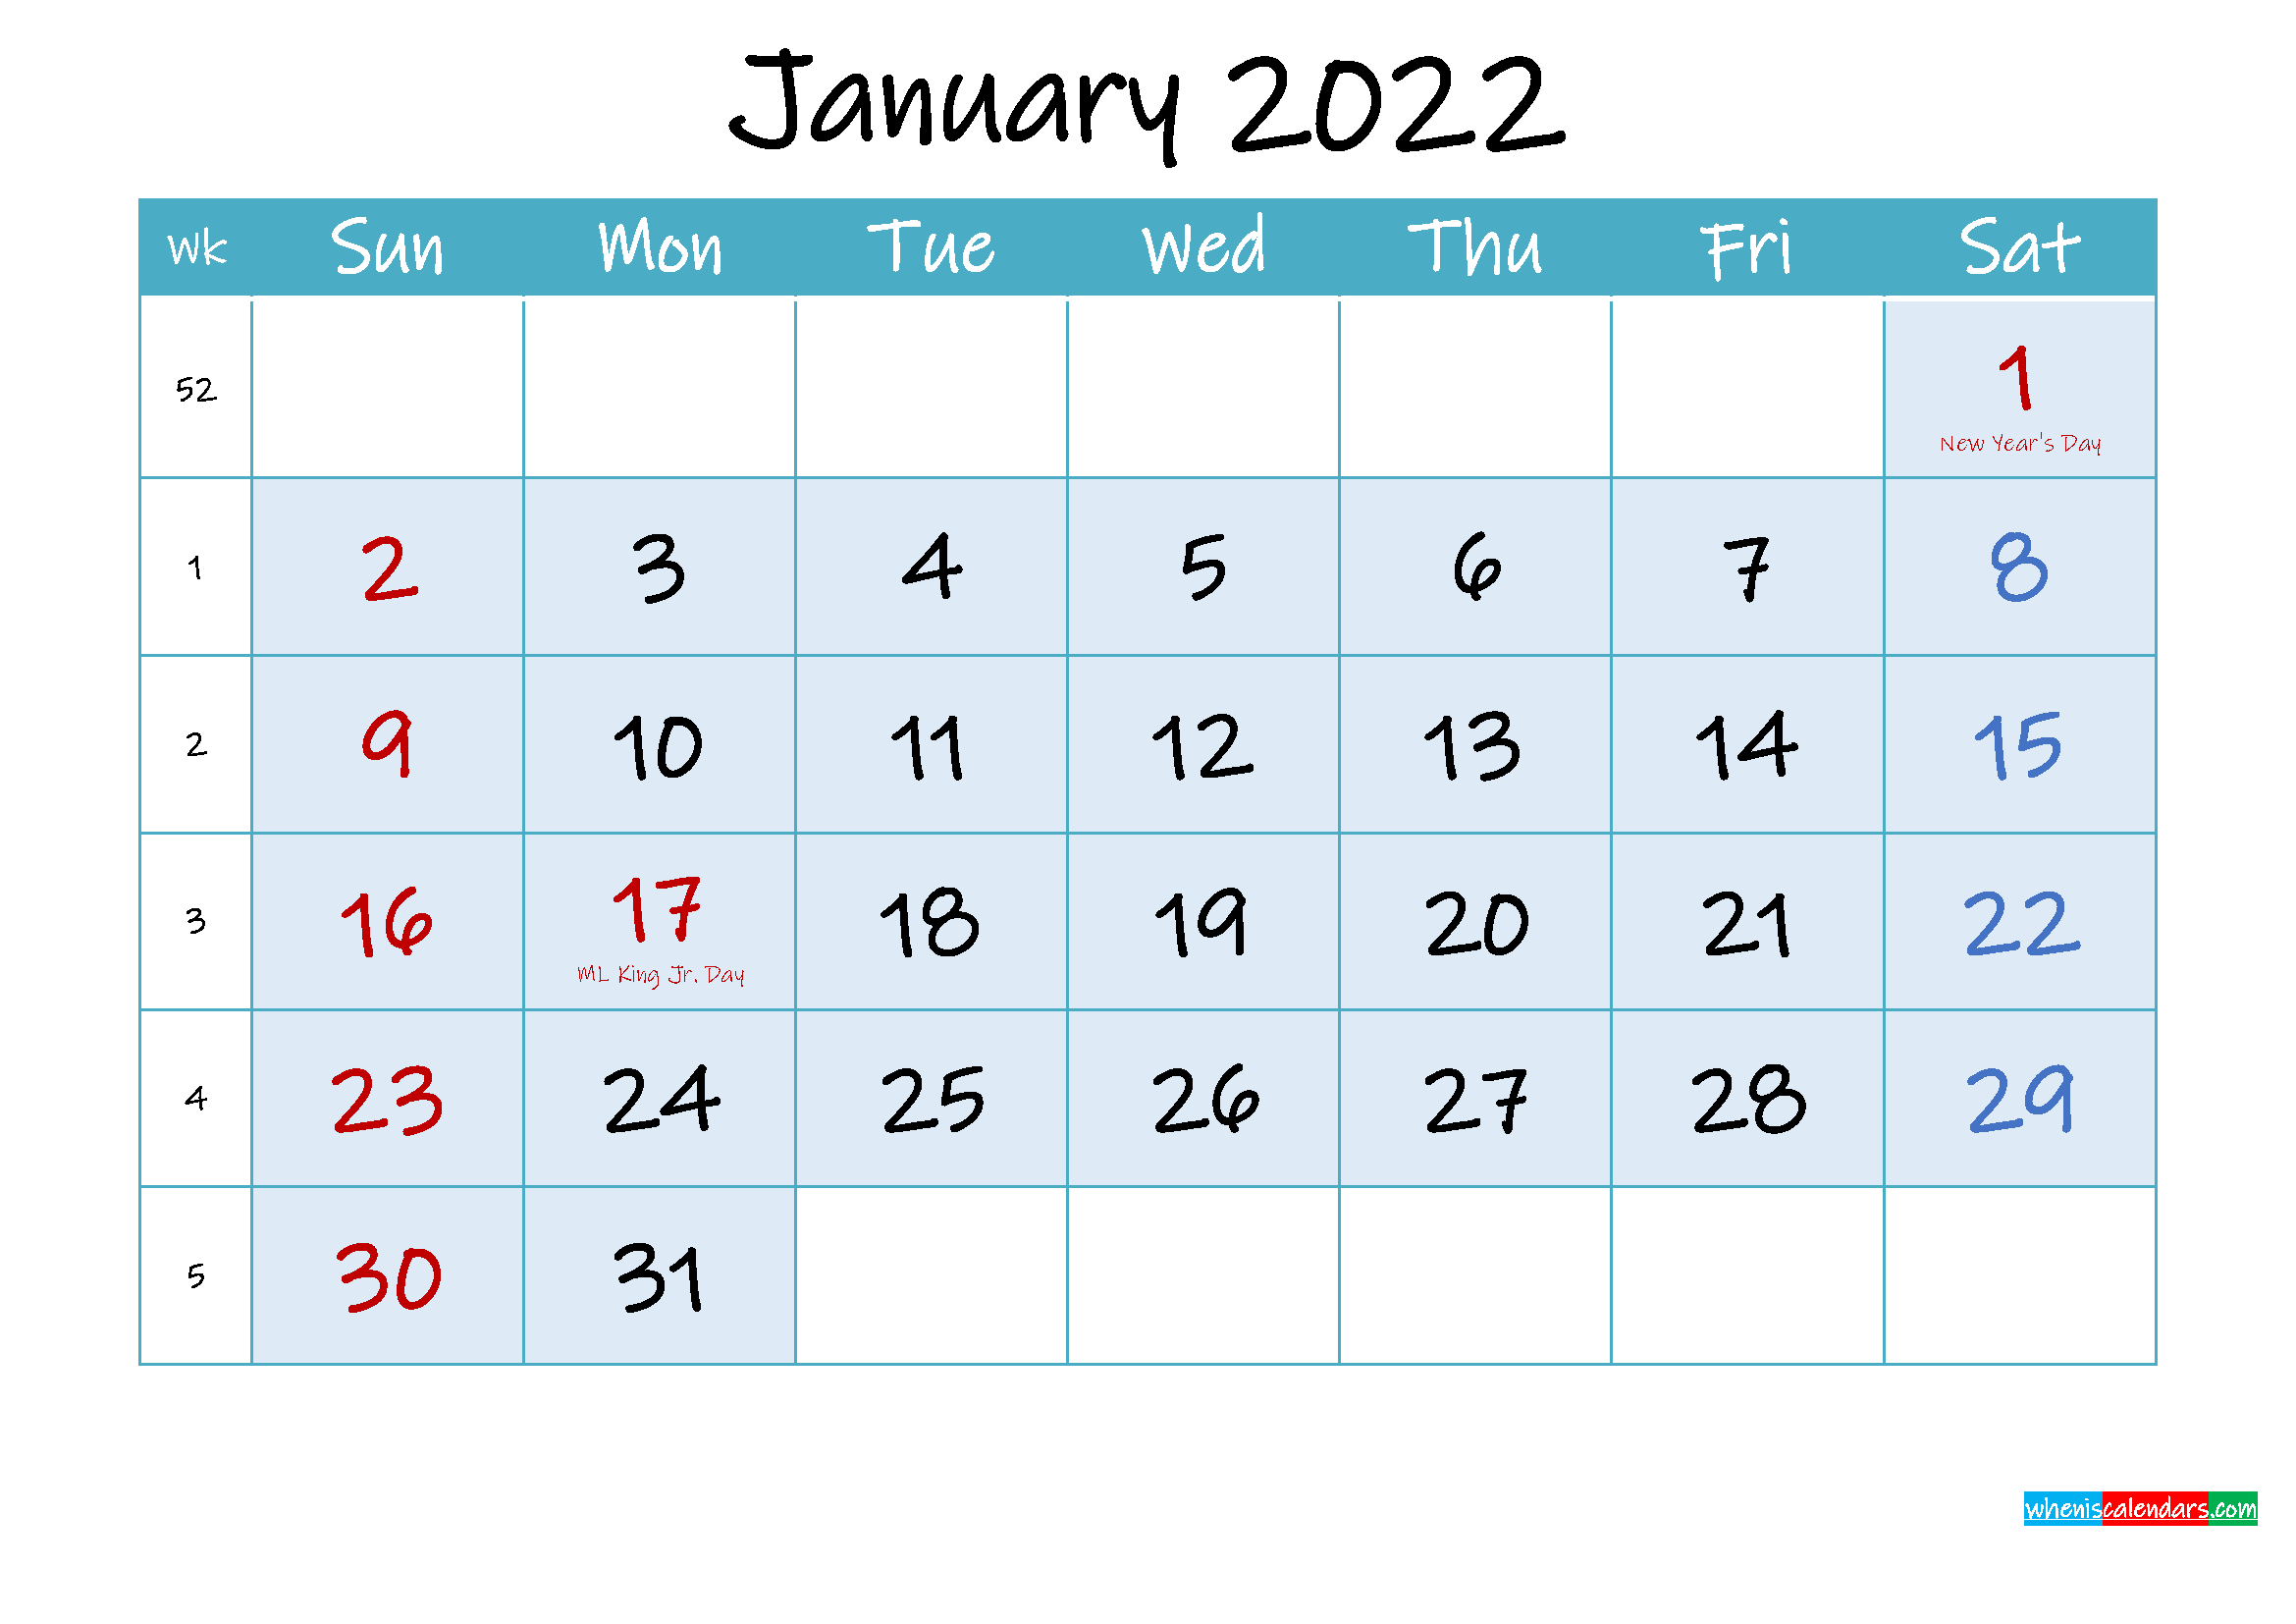 January 2022 Free Printable Calendar with Holidays